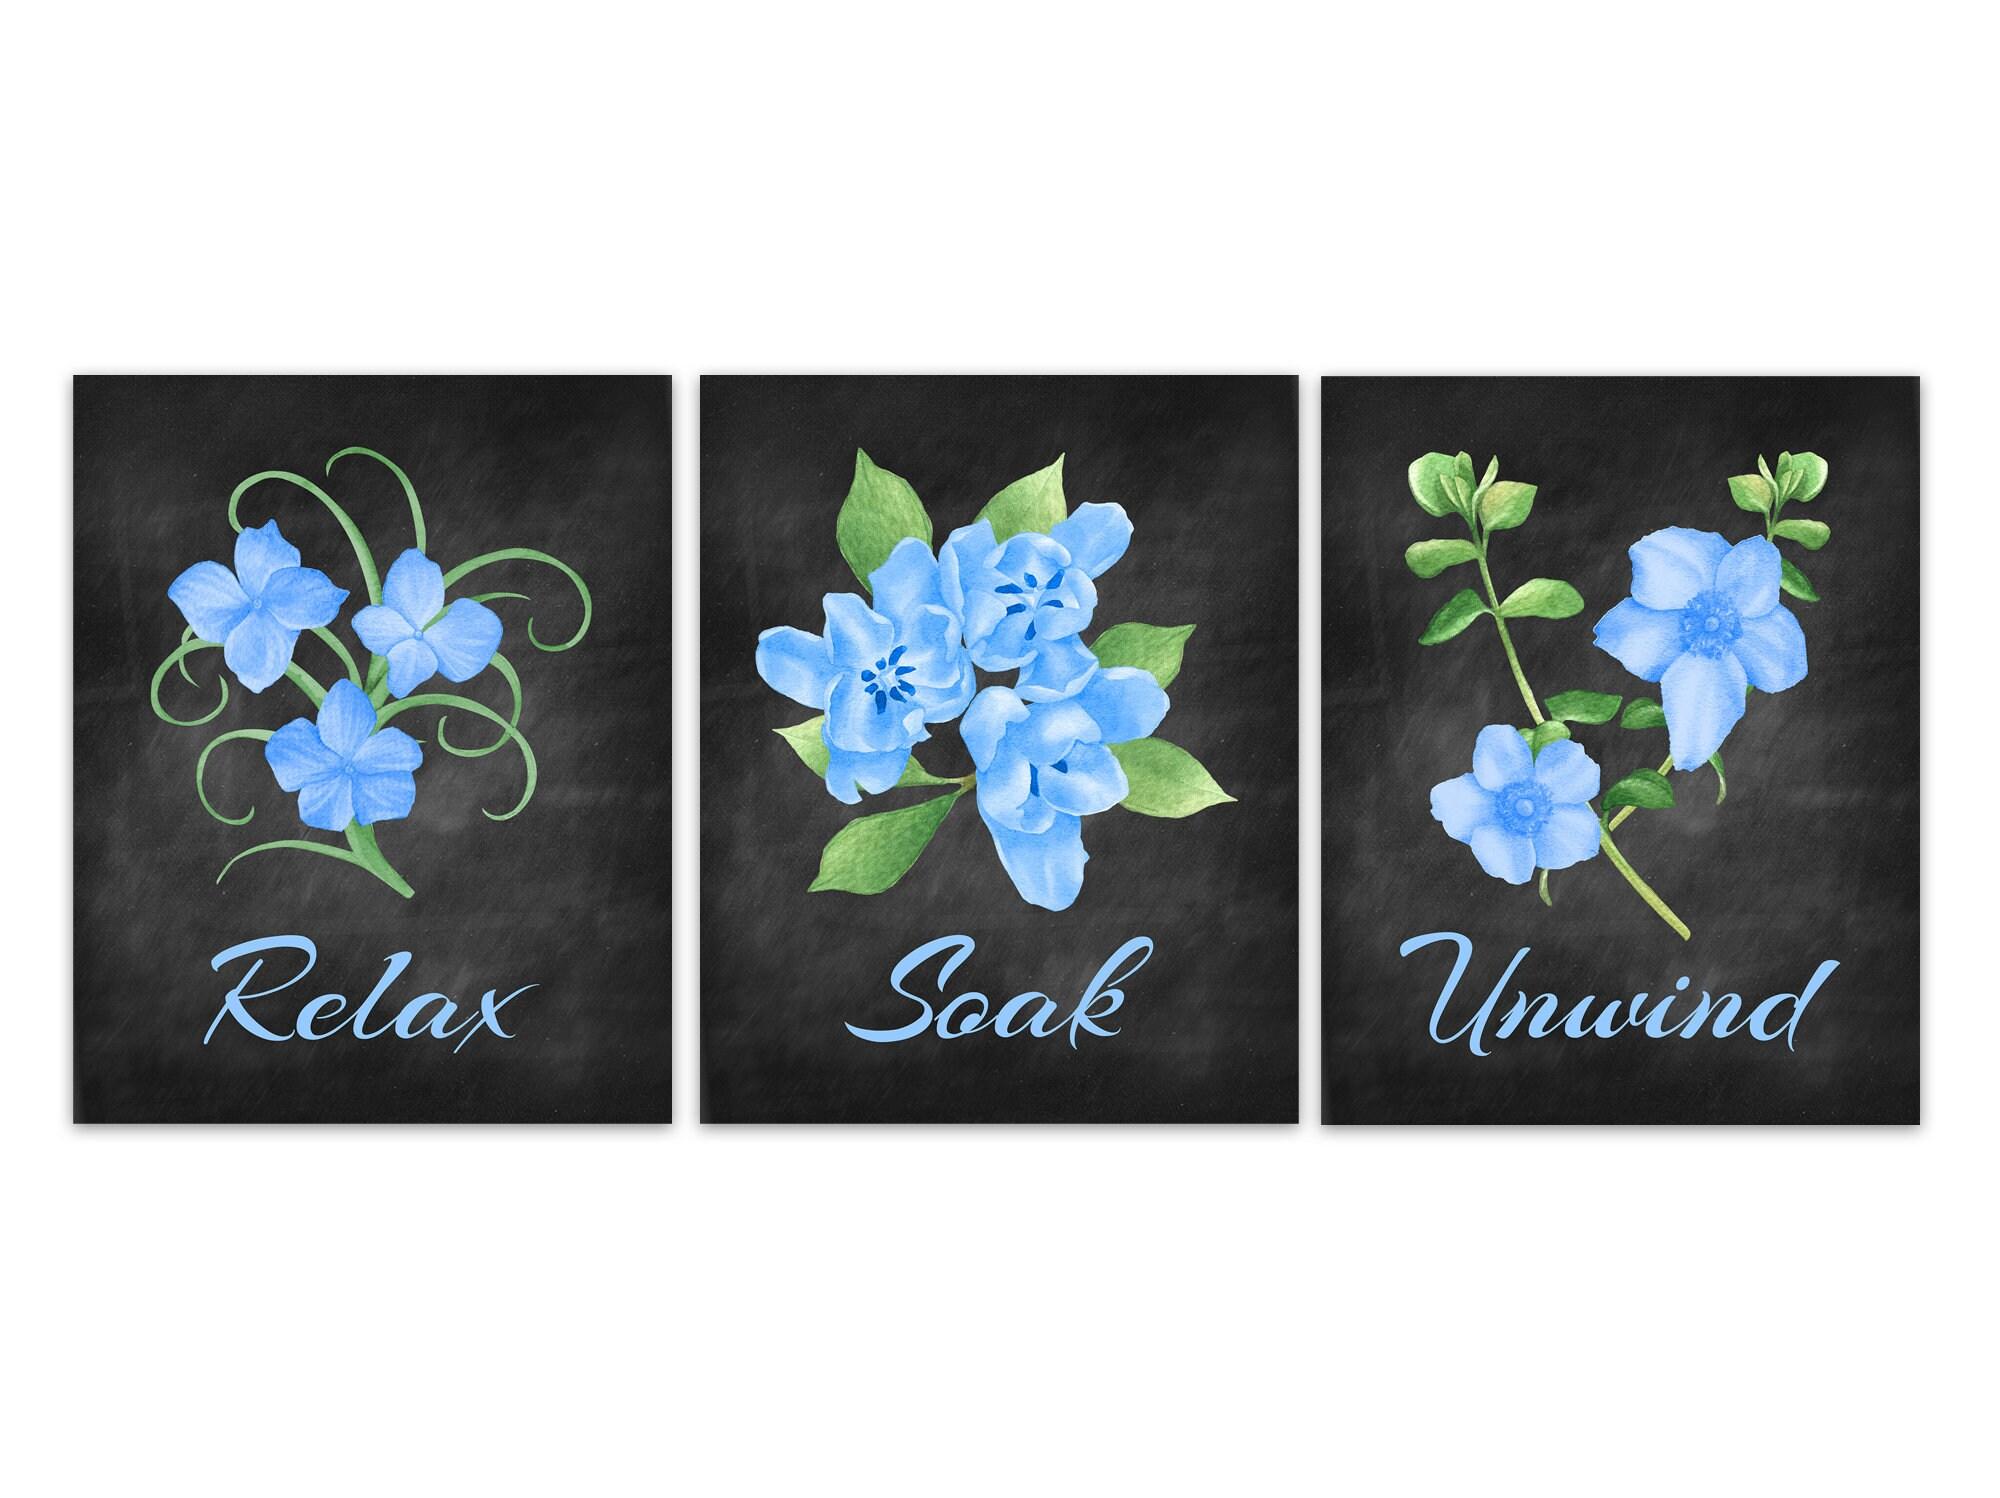 Relax Soak Unwind Bathroom Canvas Floral Bathroom Decor Blue